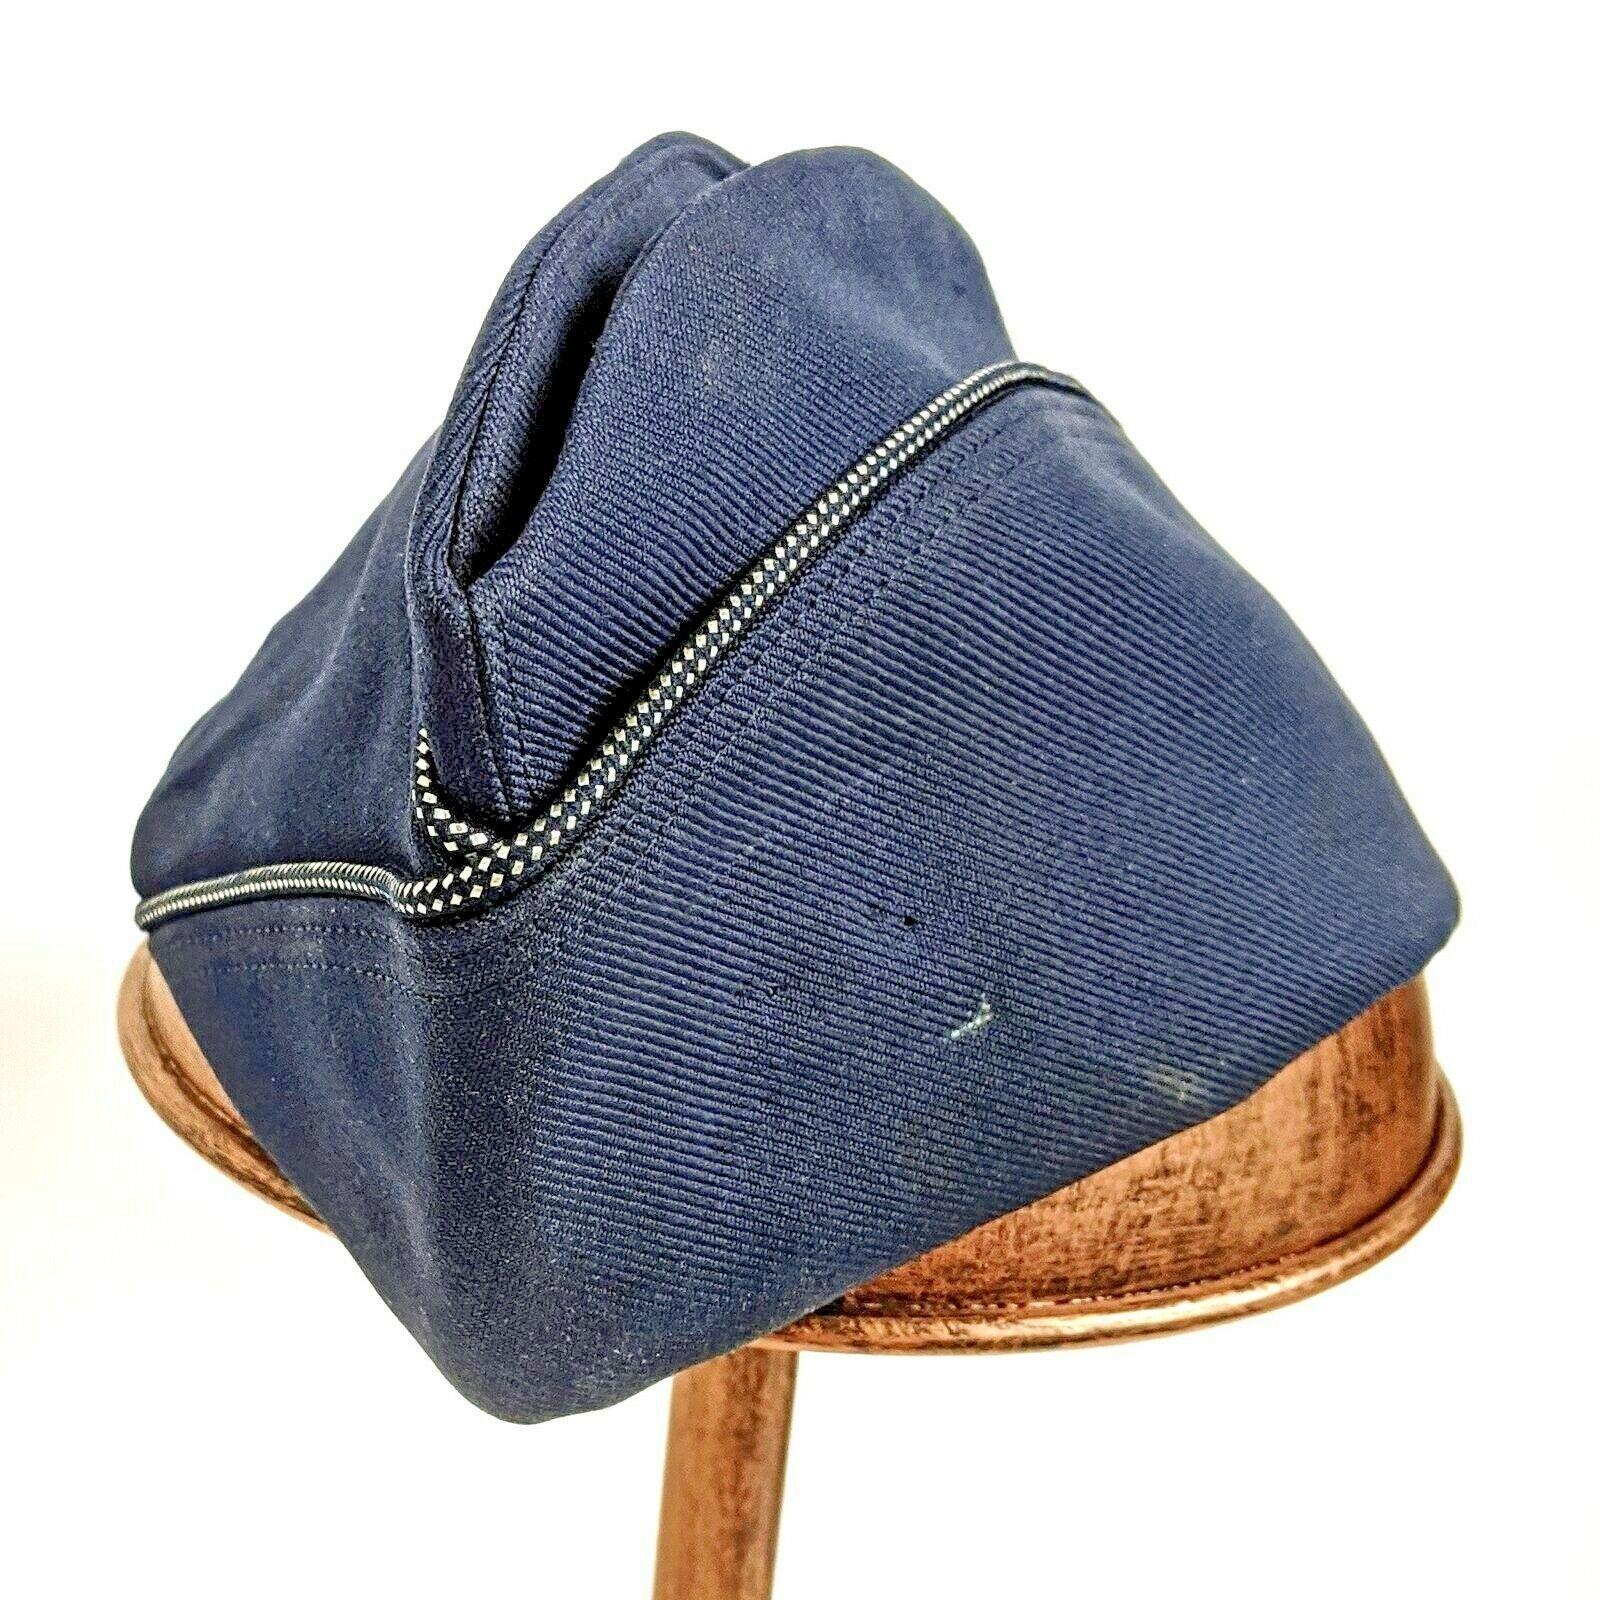 Vintage US Air Force Garrison Captain Blue Womens Wedge Military Cap Size 23 1/2 - $22.02